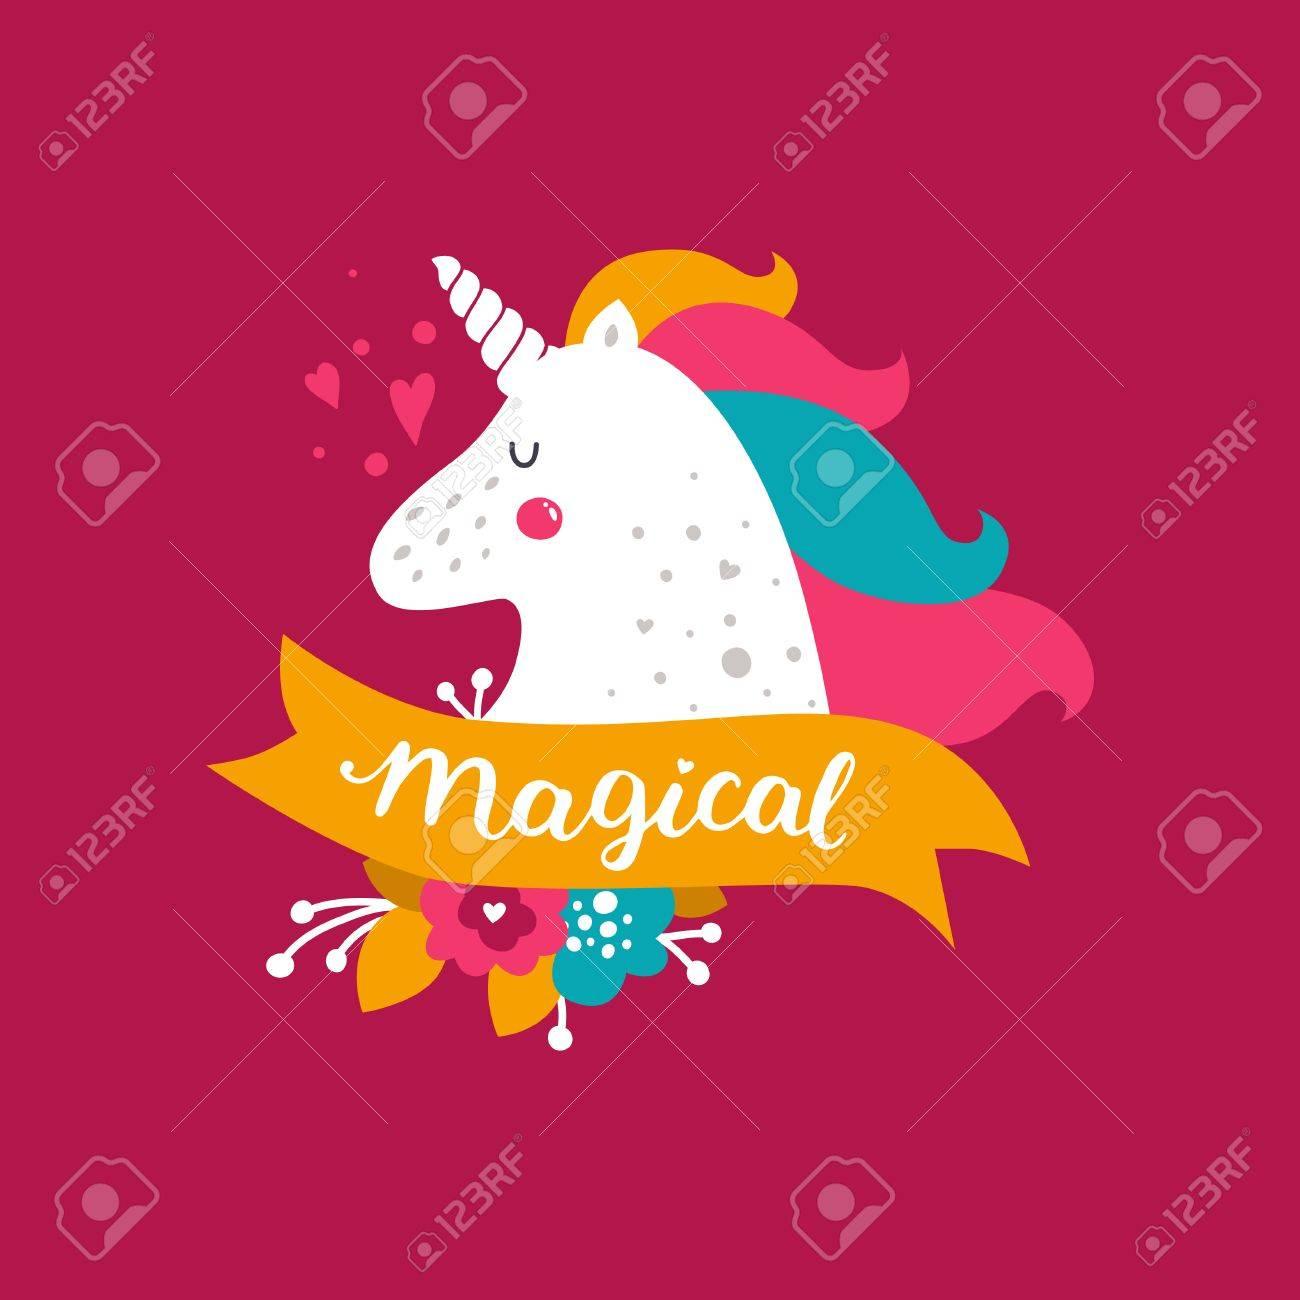 vector baby unicorn kids illustration for design prints cards